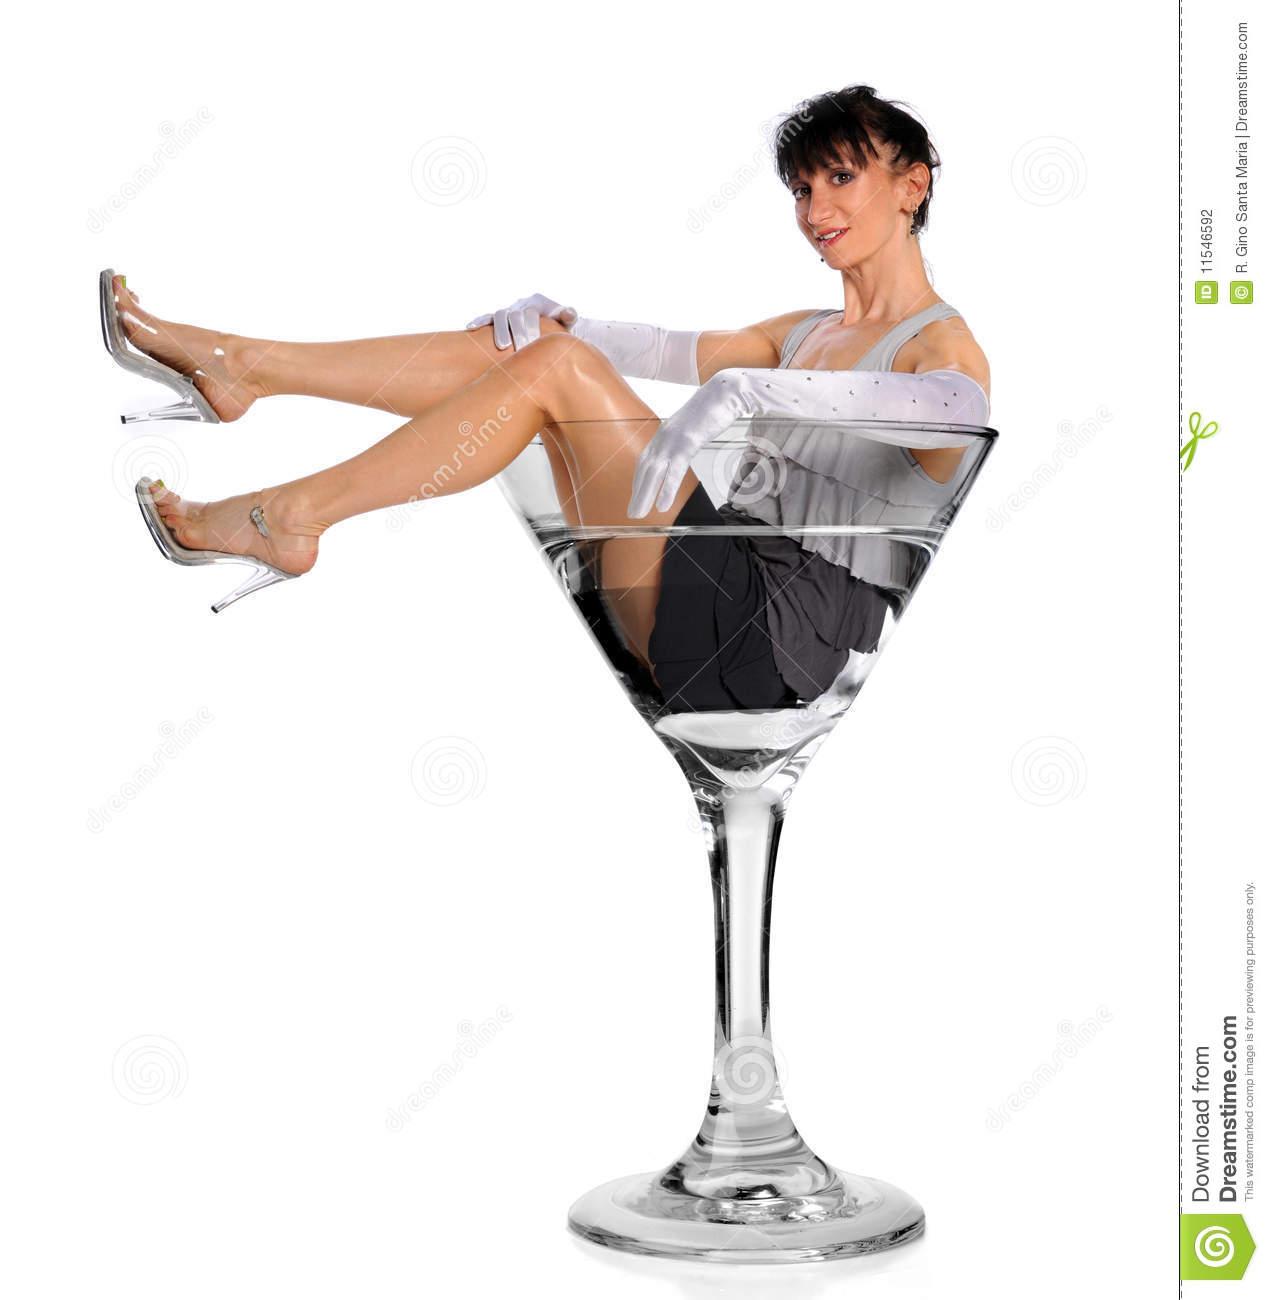 Frau im cocktailglas clipart royalty free Frau Im Martini-Glas Stockfotografie - Bild: 11546592 royalty free